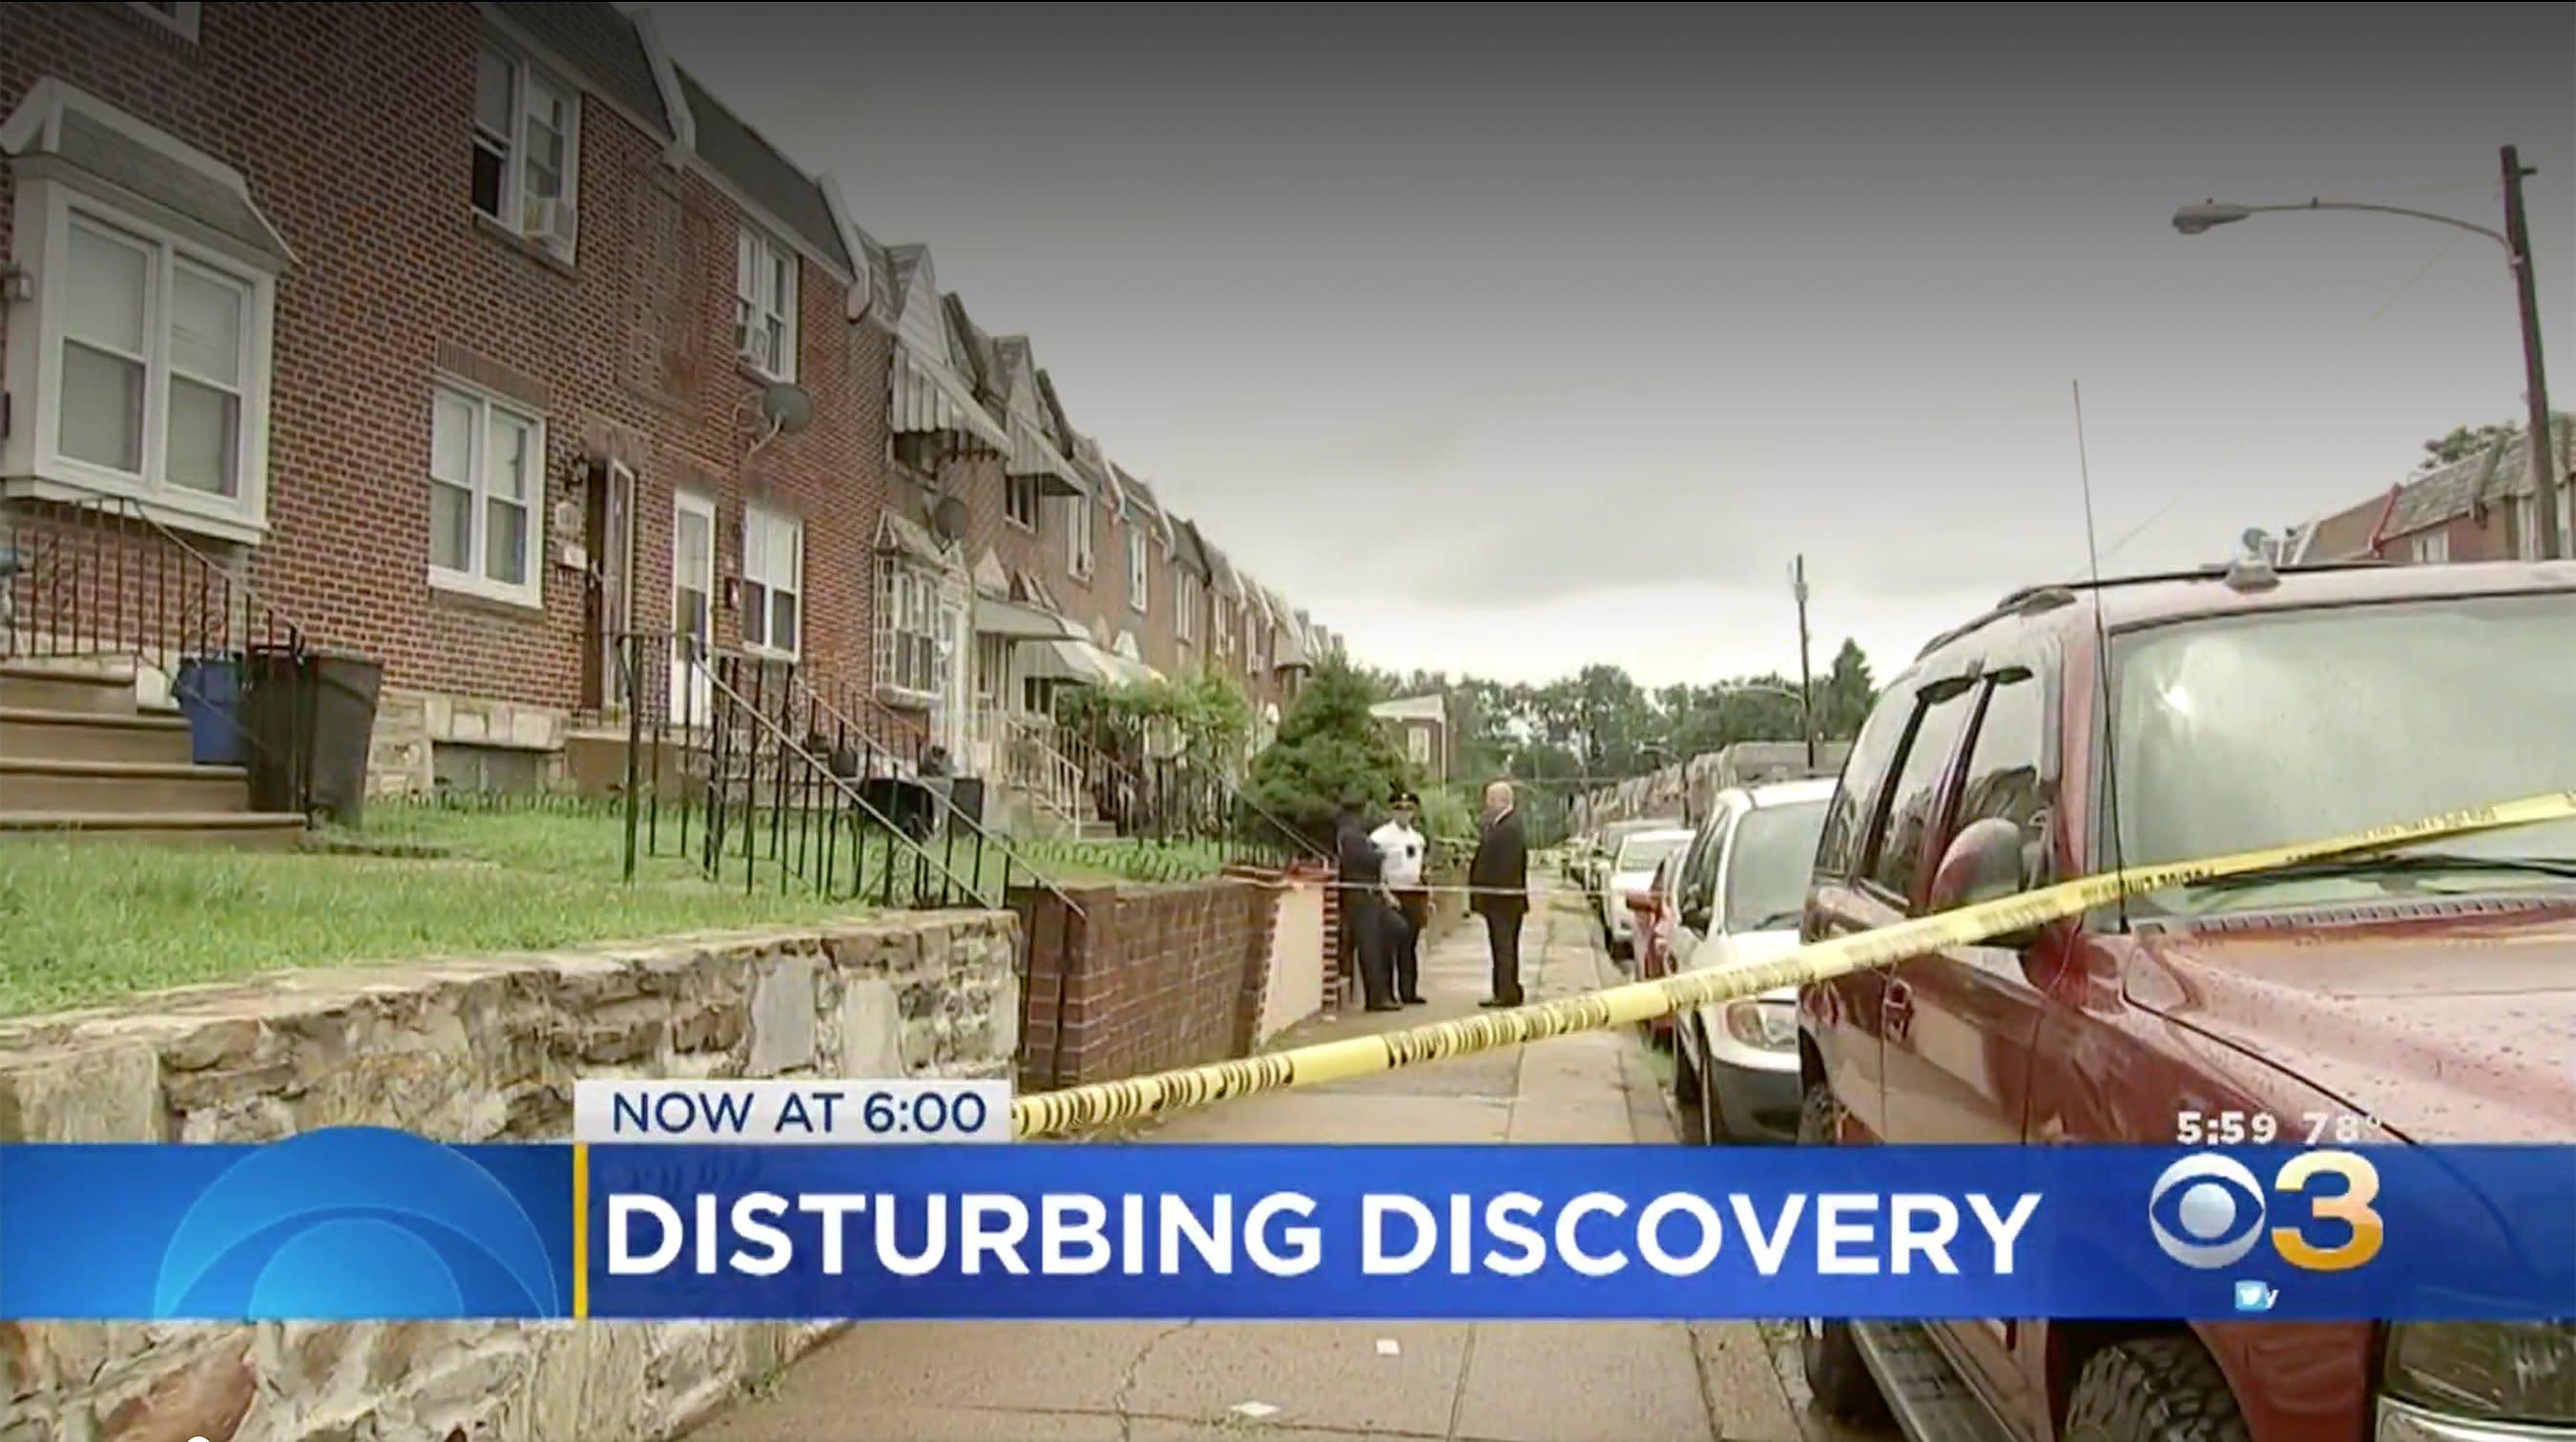 Philadelphia Cop Kills Wife, Self in Apparent Murder-Suicide: 'Very Sad'